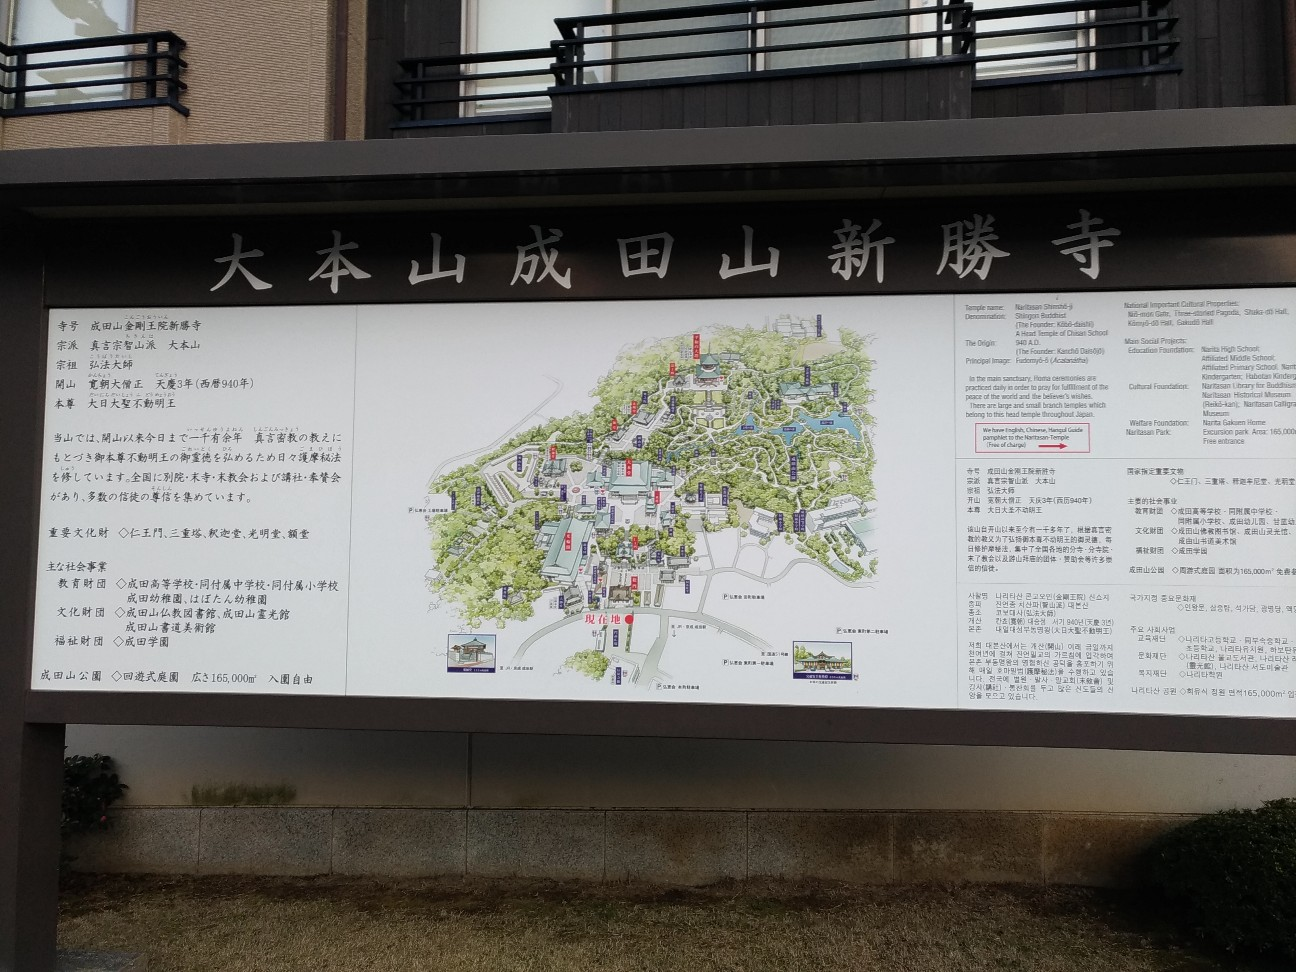 f:id:HKT1989:20200110130306j:image